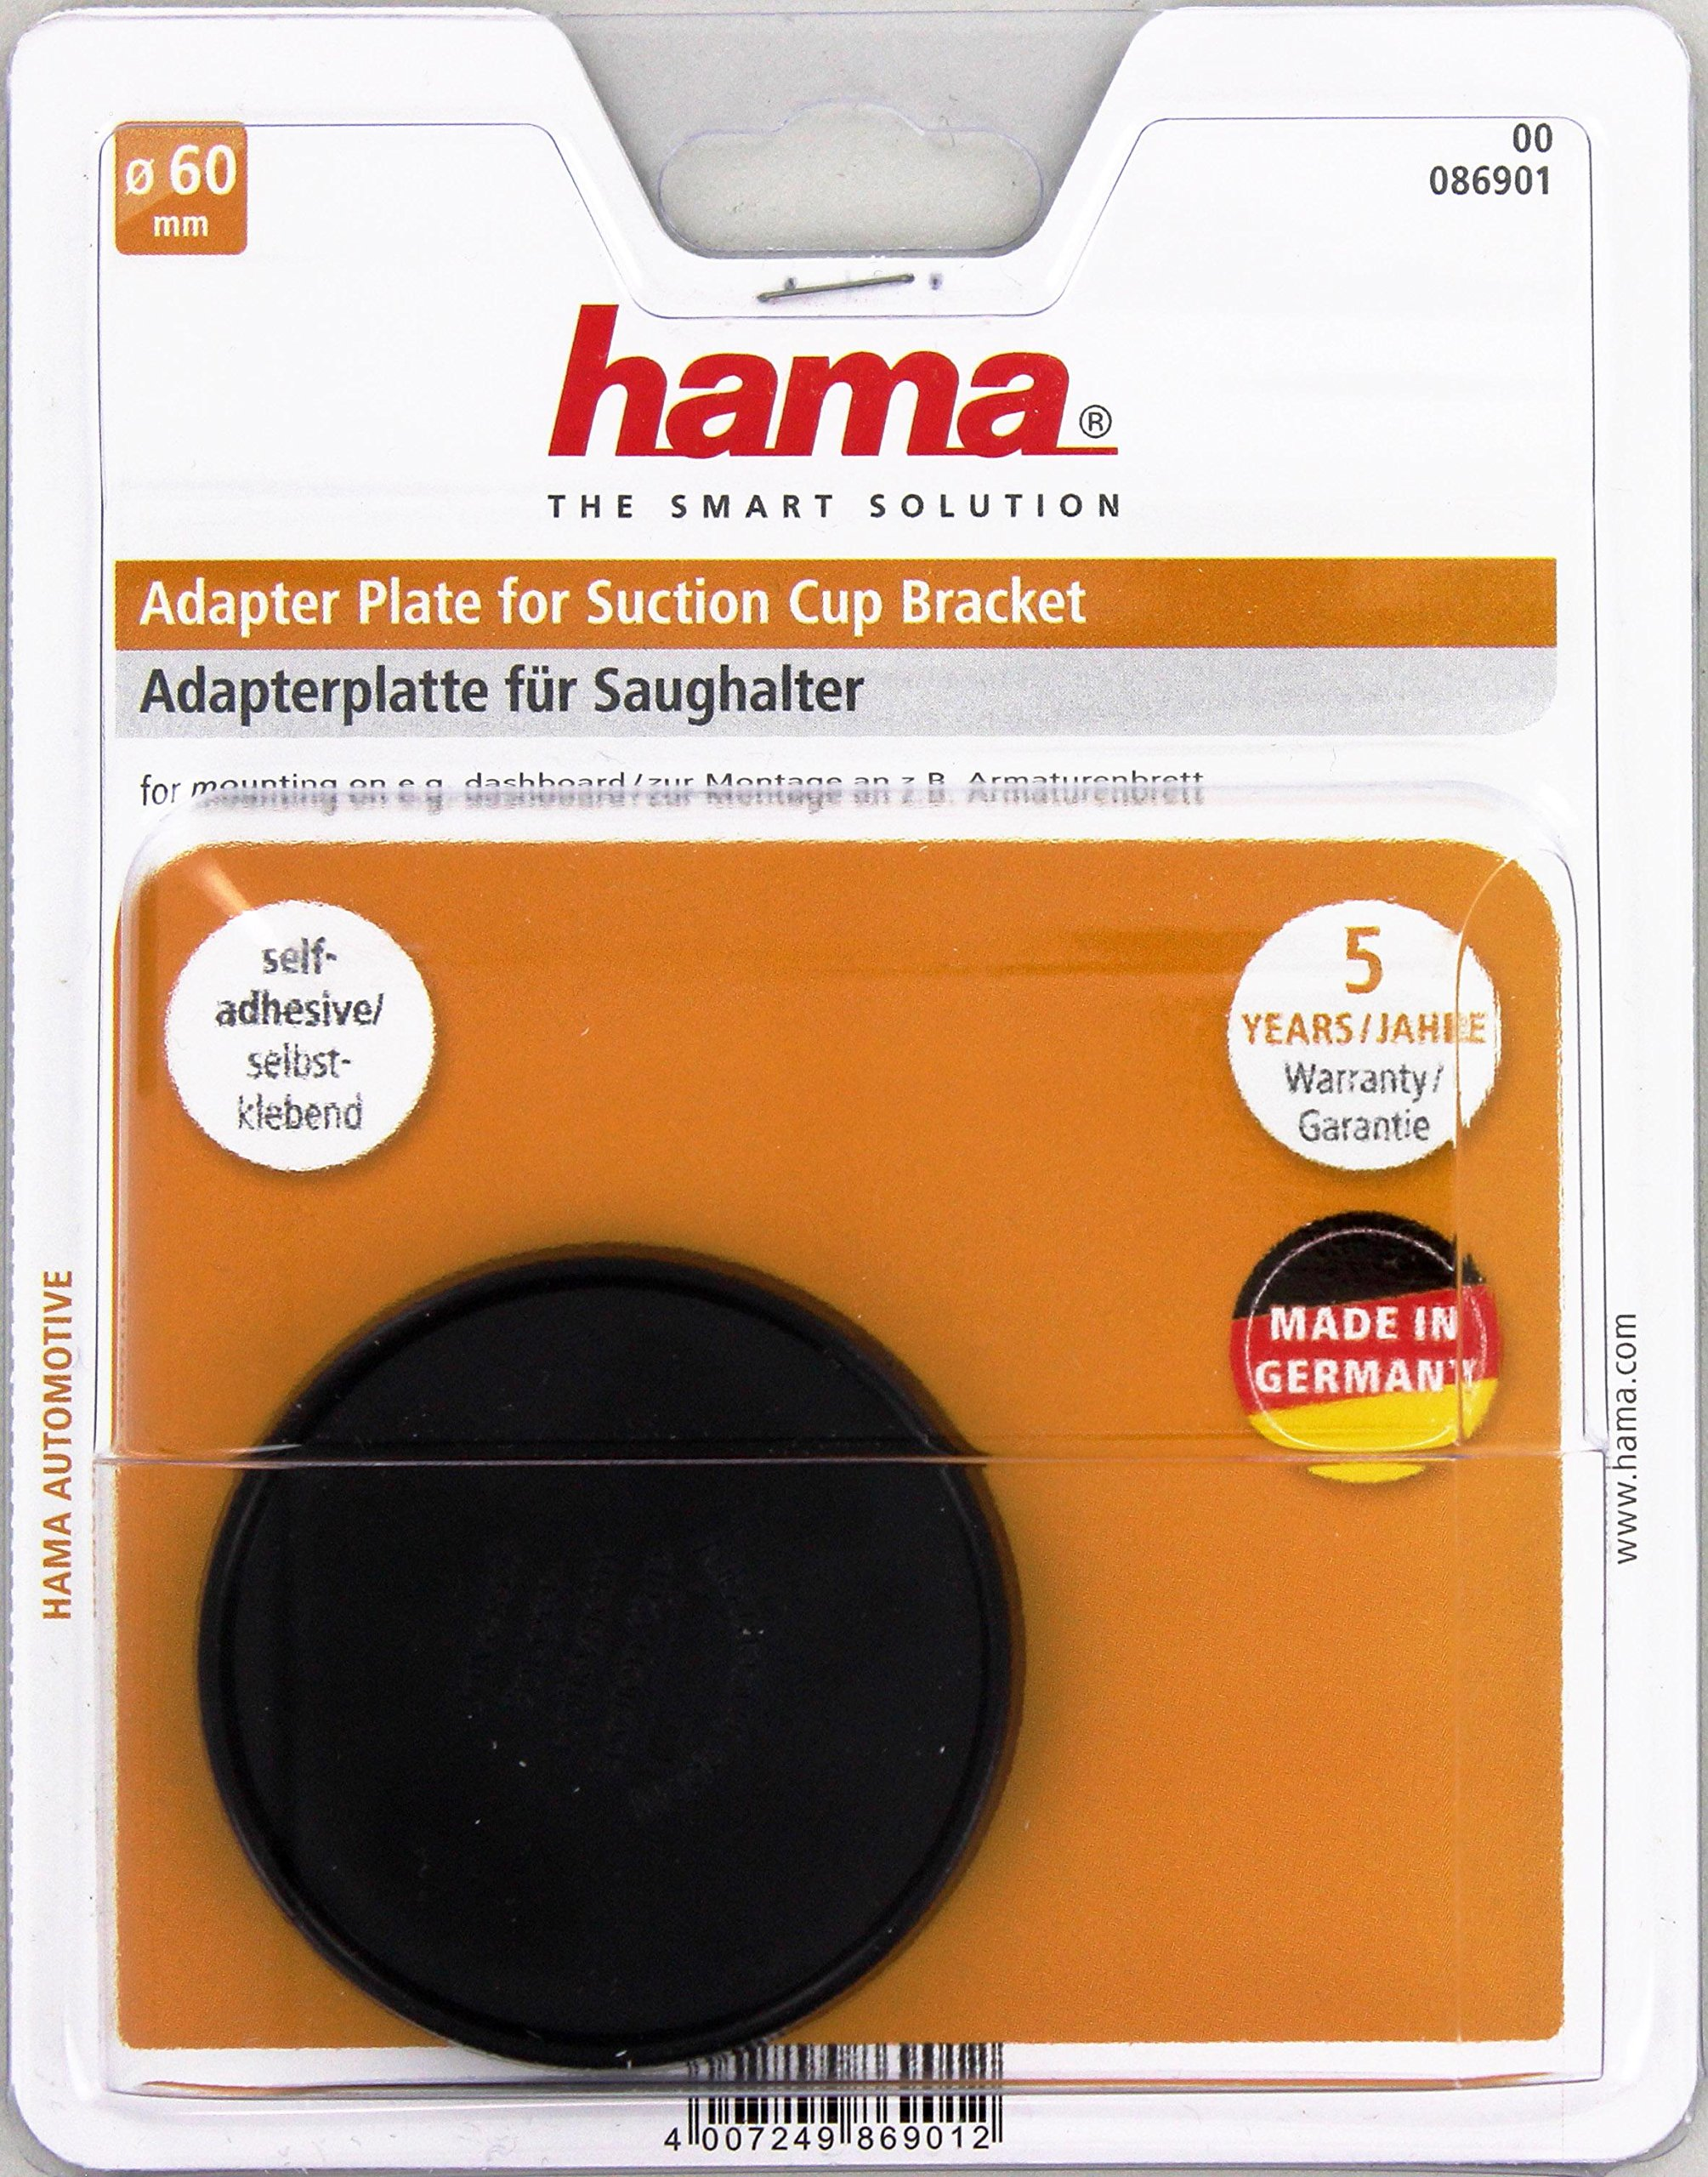 Hama-Adapterplatte-fr-Saughalter-Selbstklebend